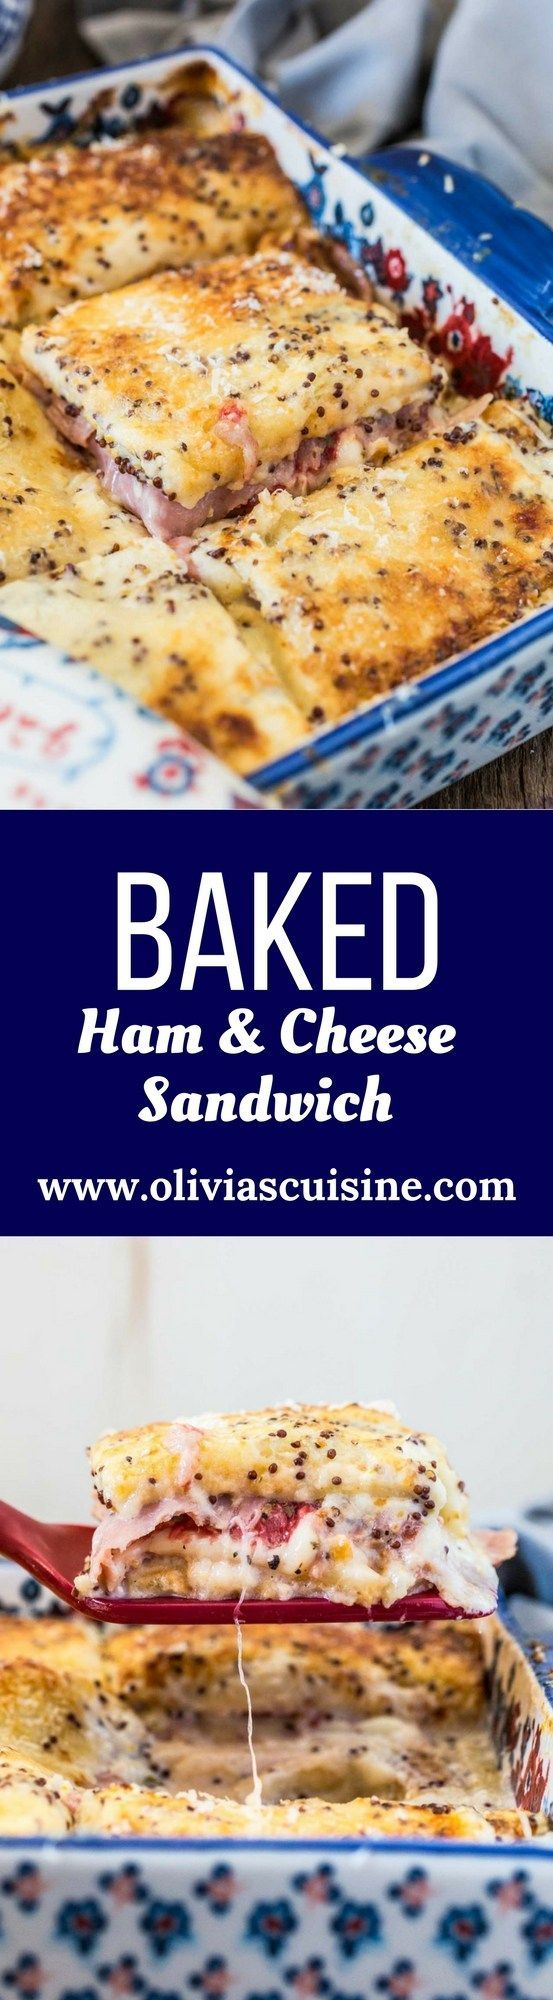 Brazilian Baked Ham and Cheese Sandwich (Bauru de Forno